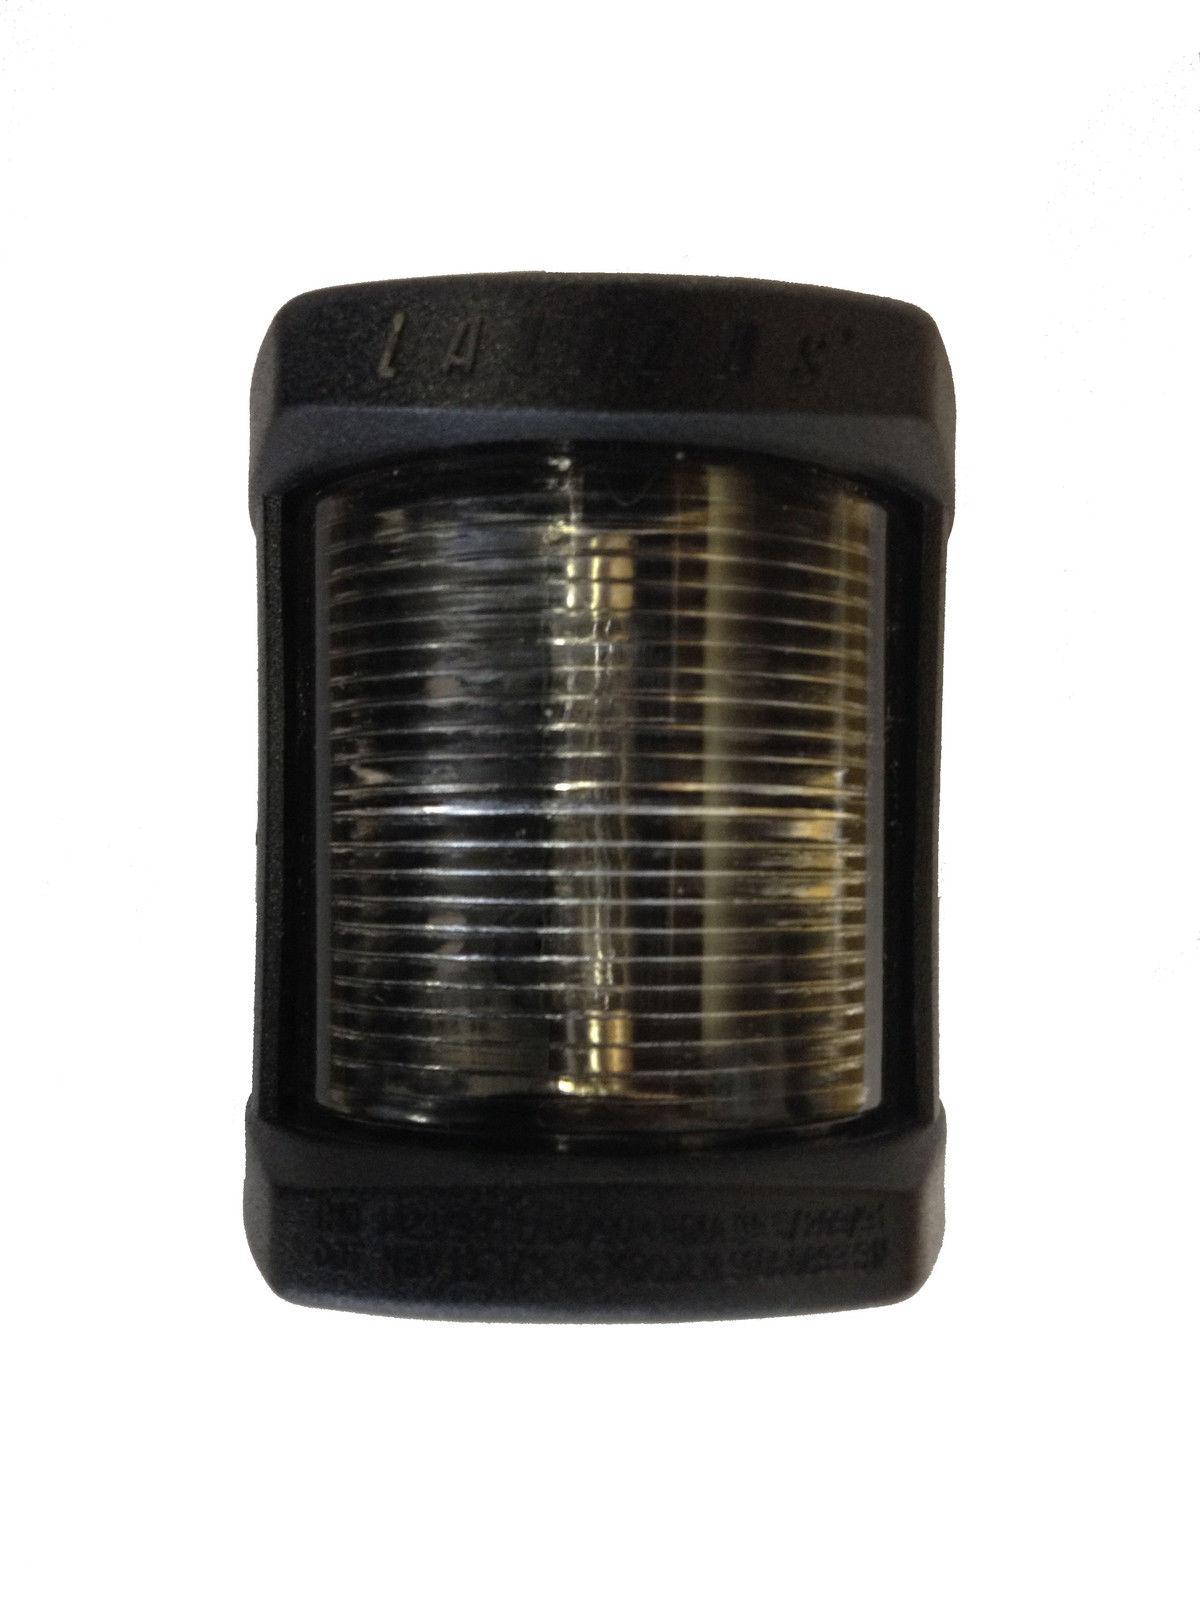 STARBOARD GREEN /'BLACK HOUSING/' 112,5 LALIZAS IC N12 MIDI NAVIGATION LIGHT